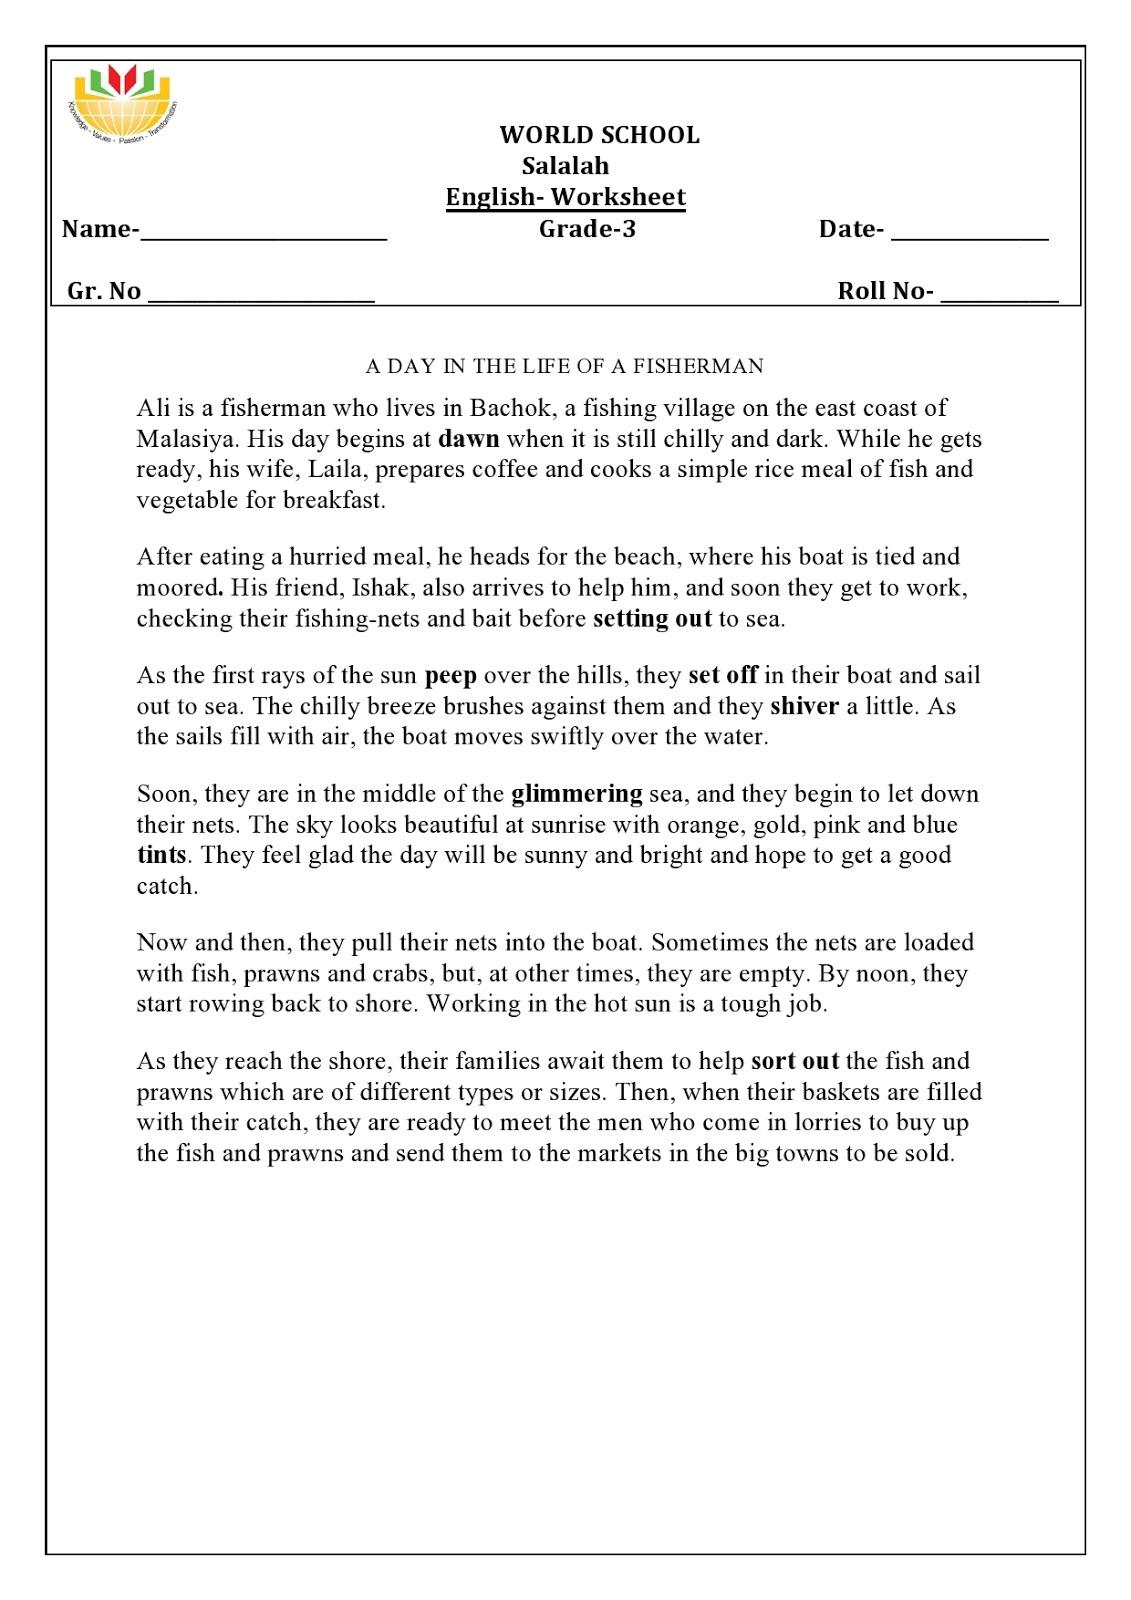 Birla World School Oman: Homework for Grade 3 as on 08/03/2018